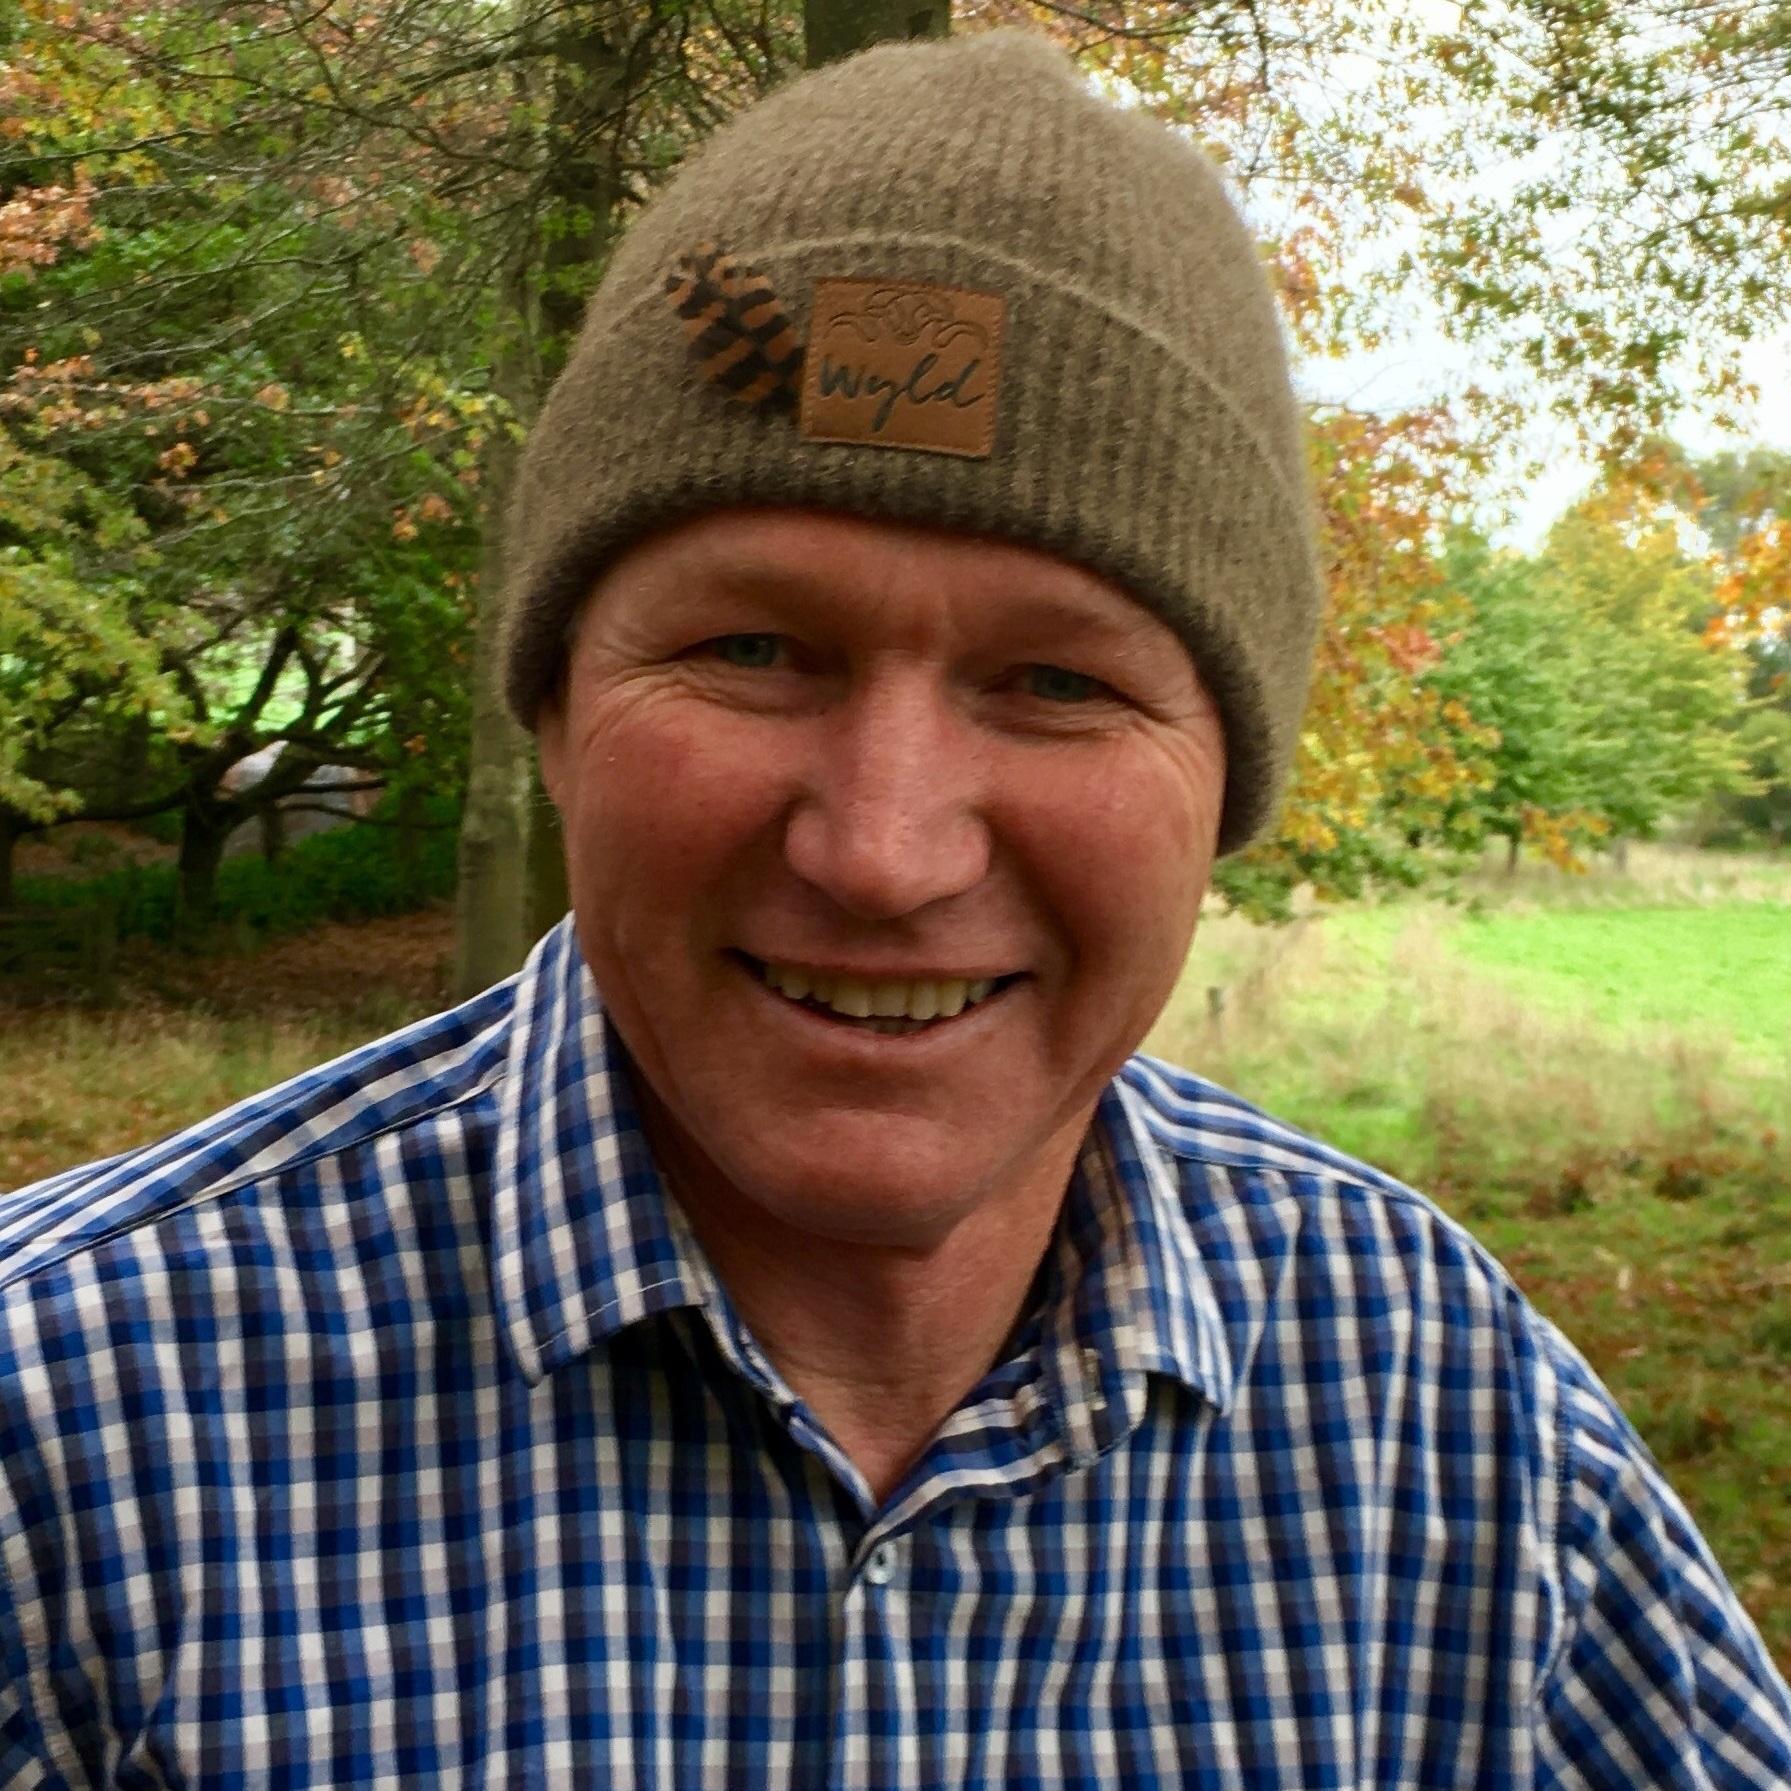 Roger Beattie - Managing Director, Wyld